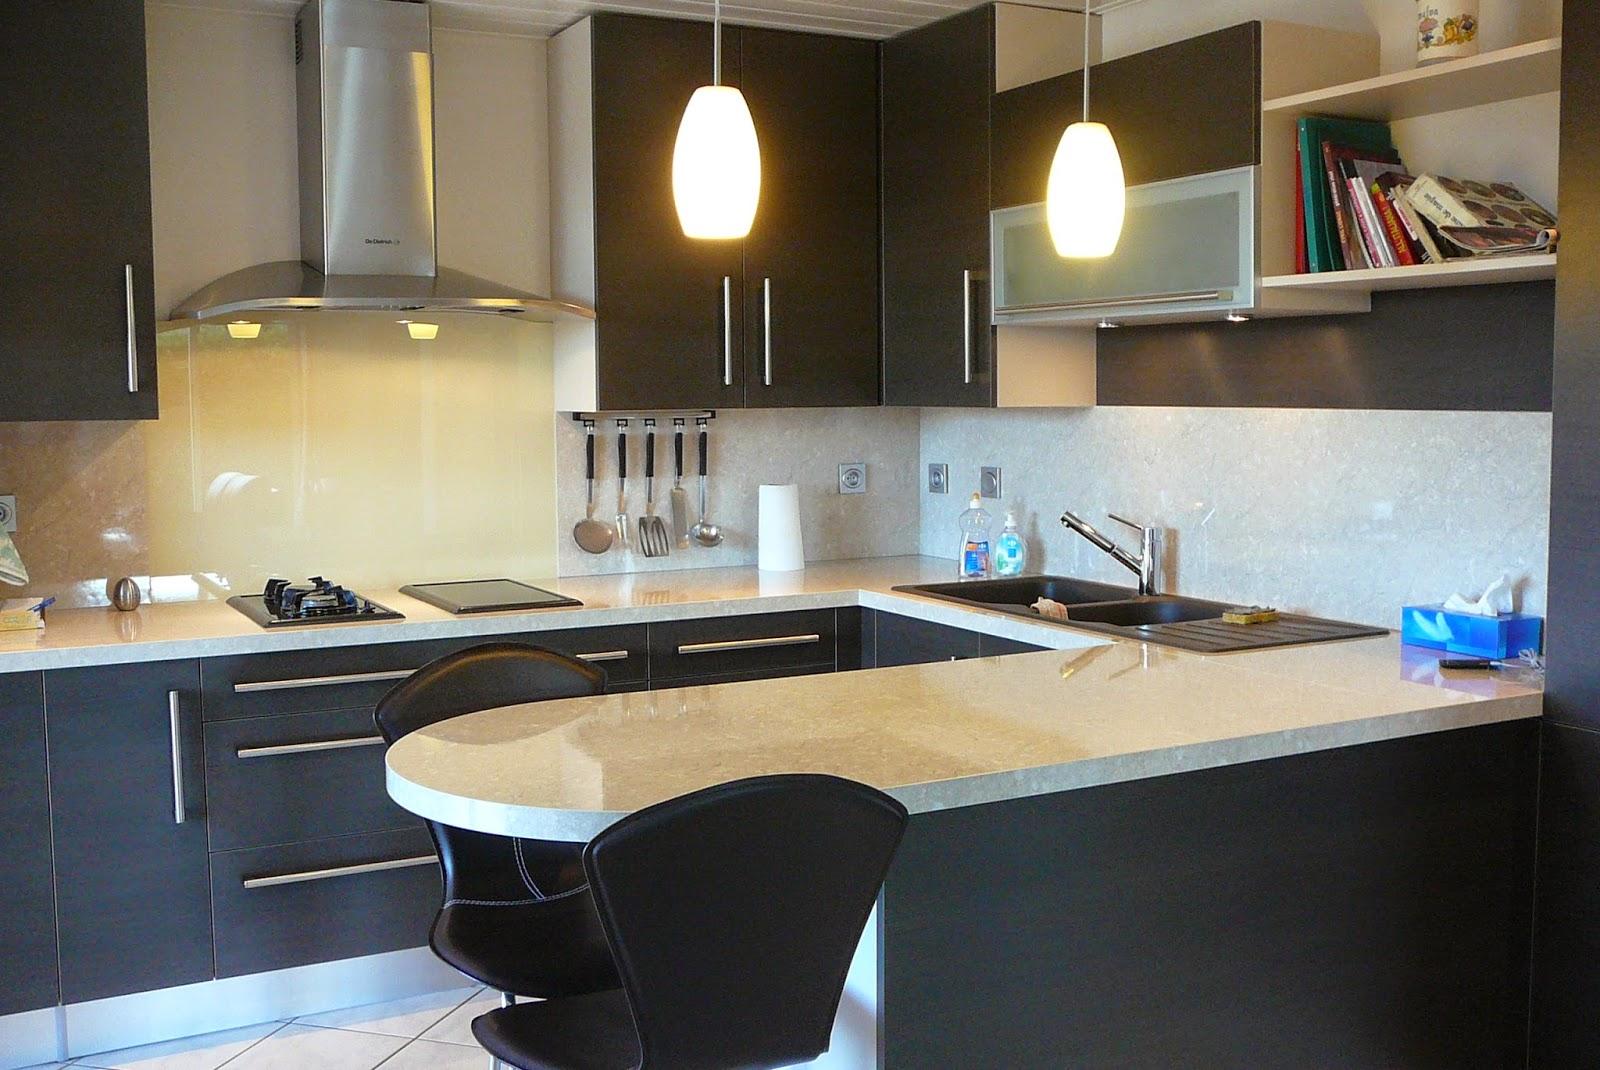 Indogatecom Cuisine Moderne Mobalpa - Pose meuble haut cuisine pour idees de deco de cuisine